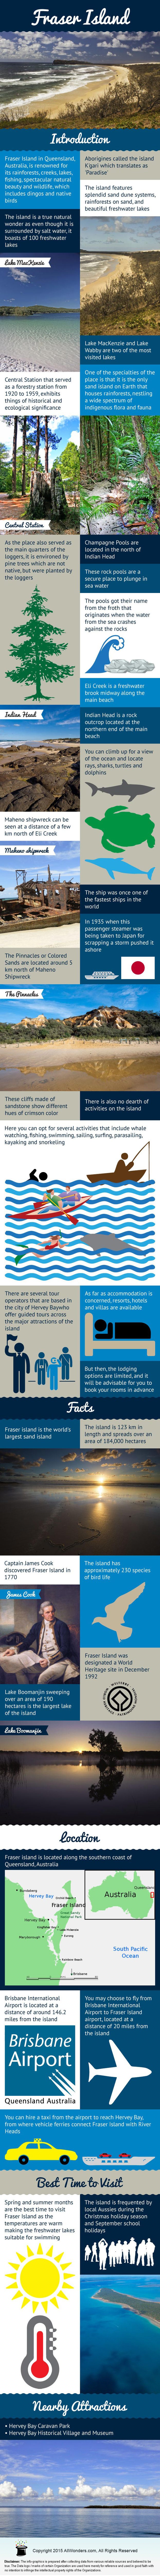 Fraser Island Infographic